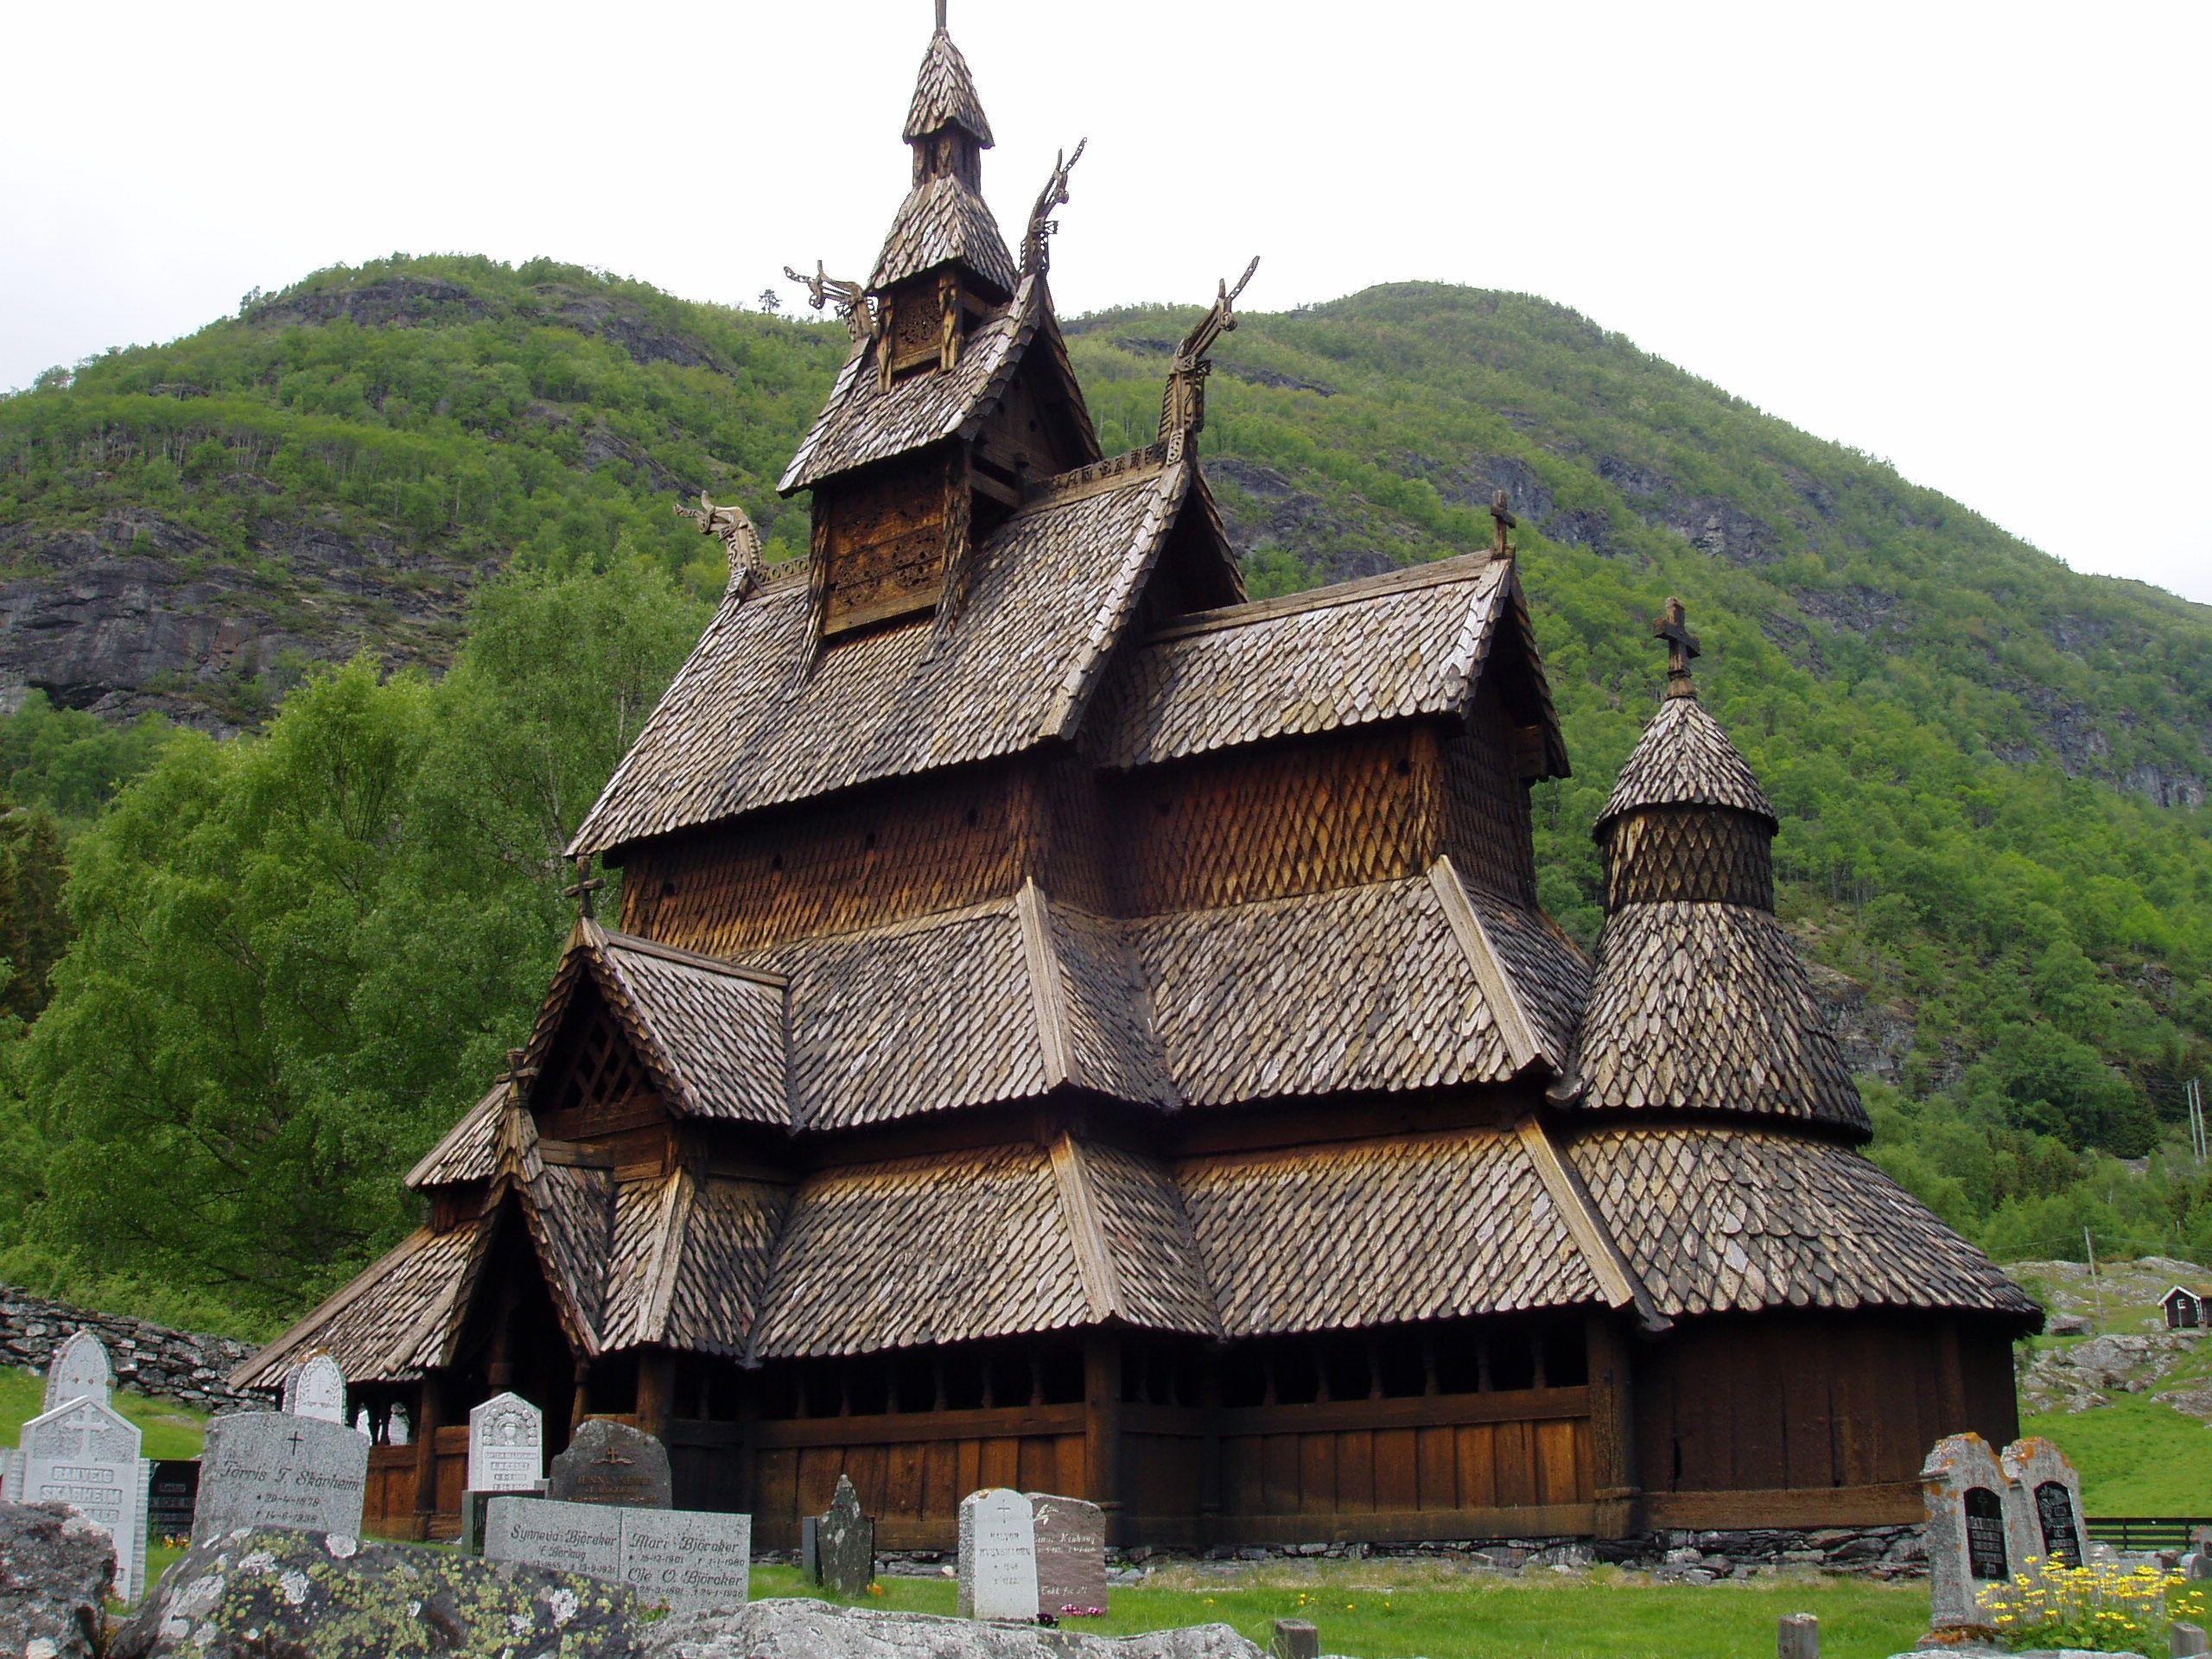 850 year old wooden Church Borgund Norway A Stave